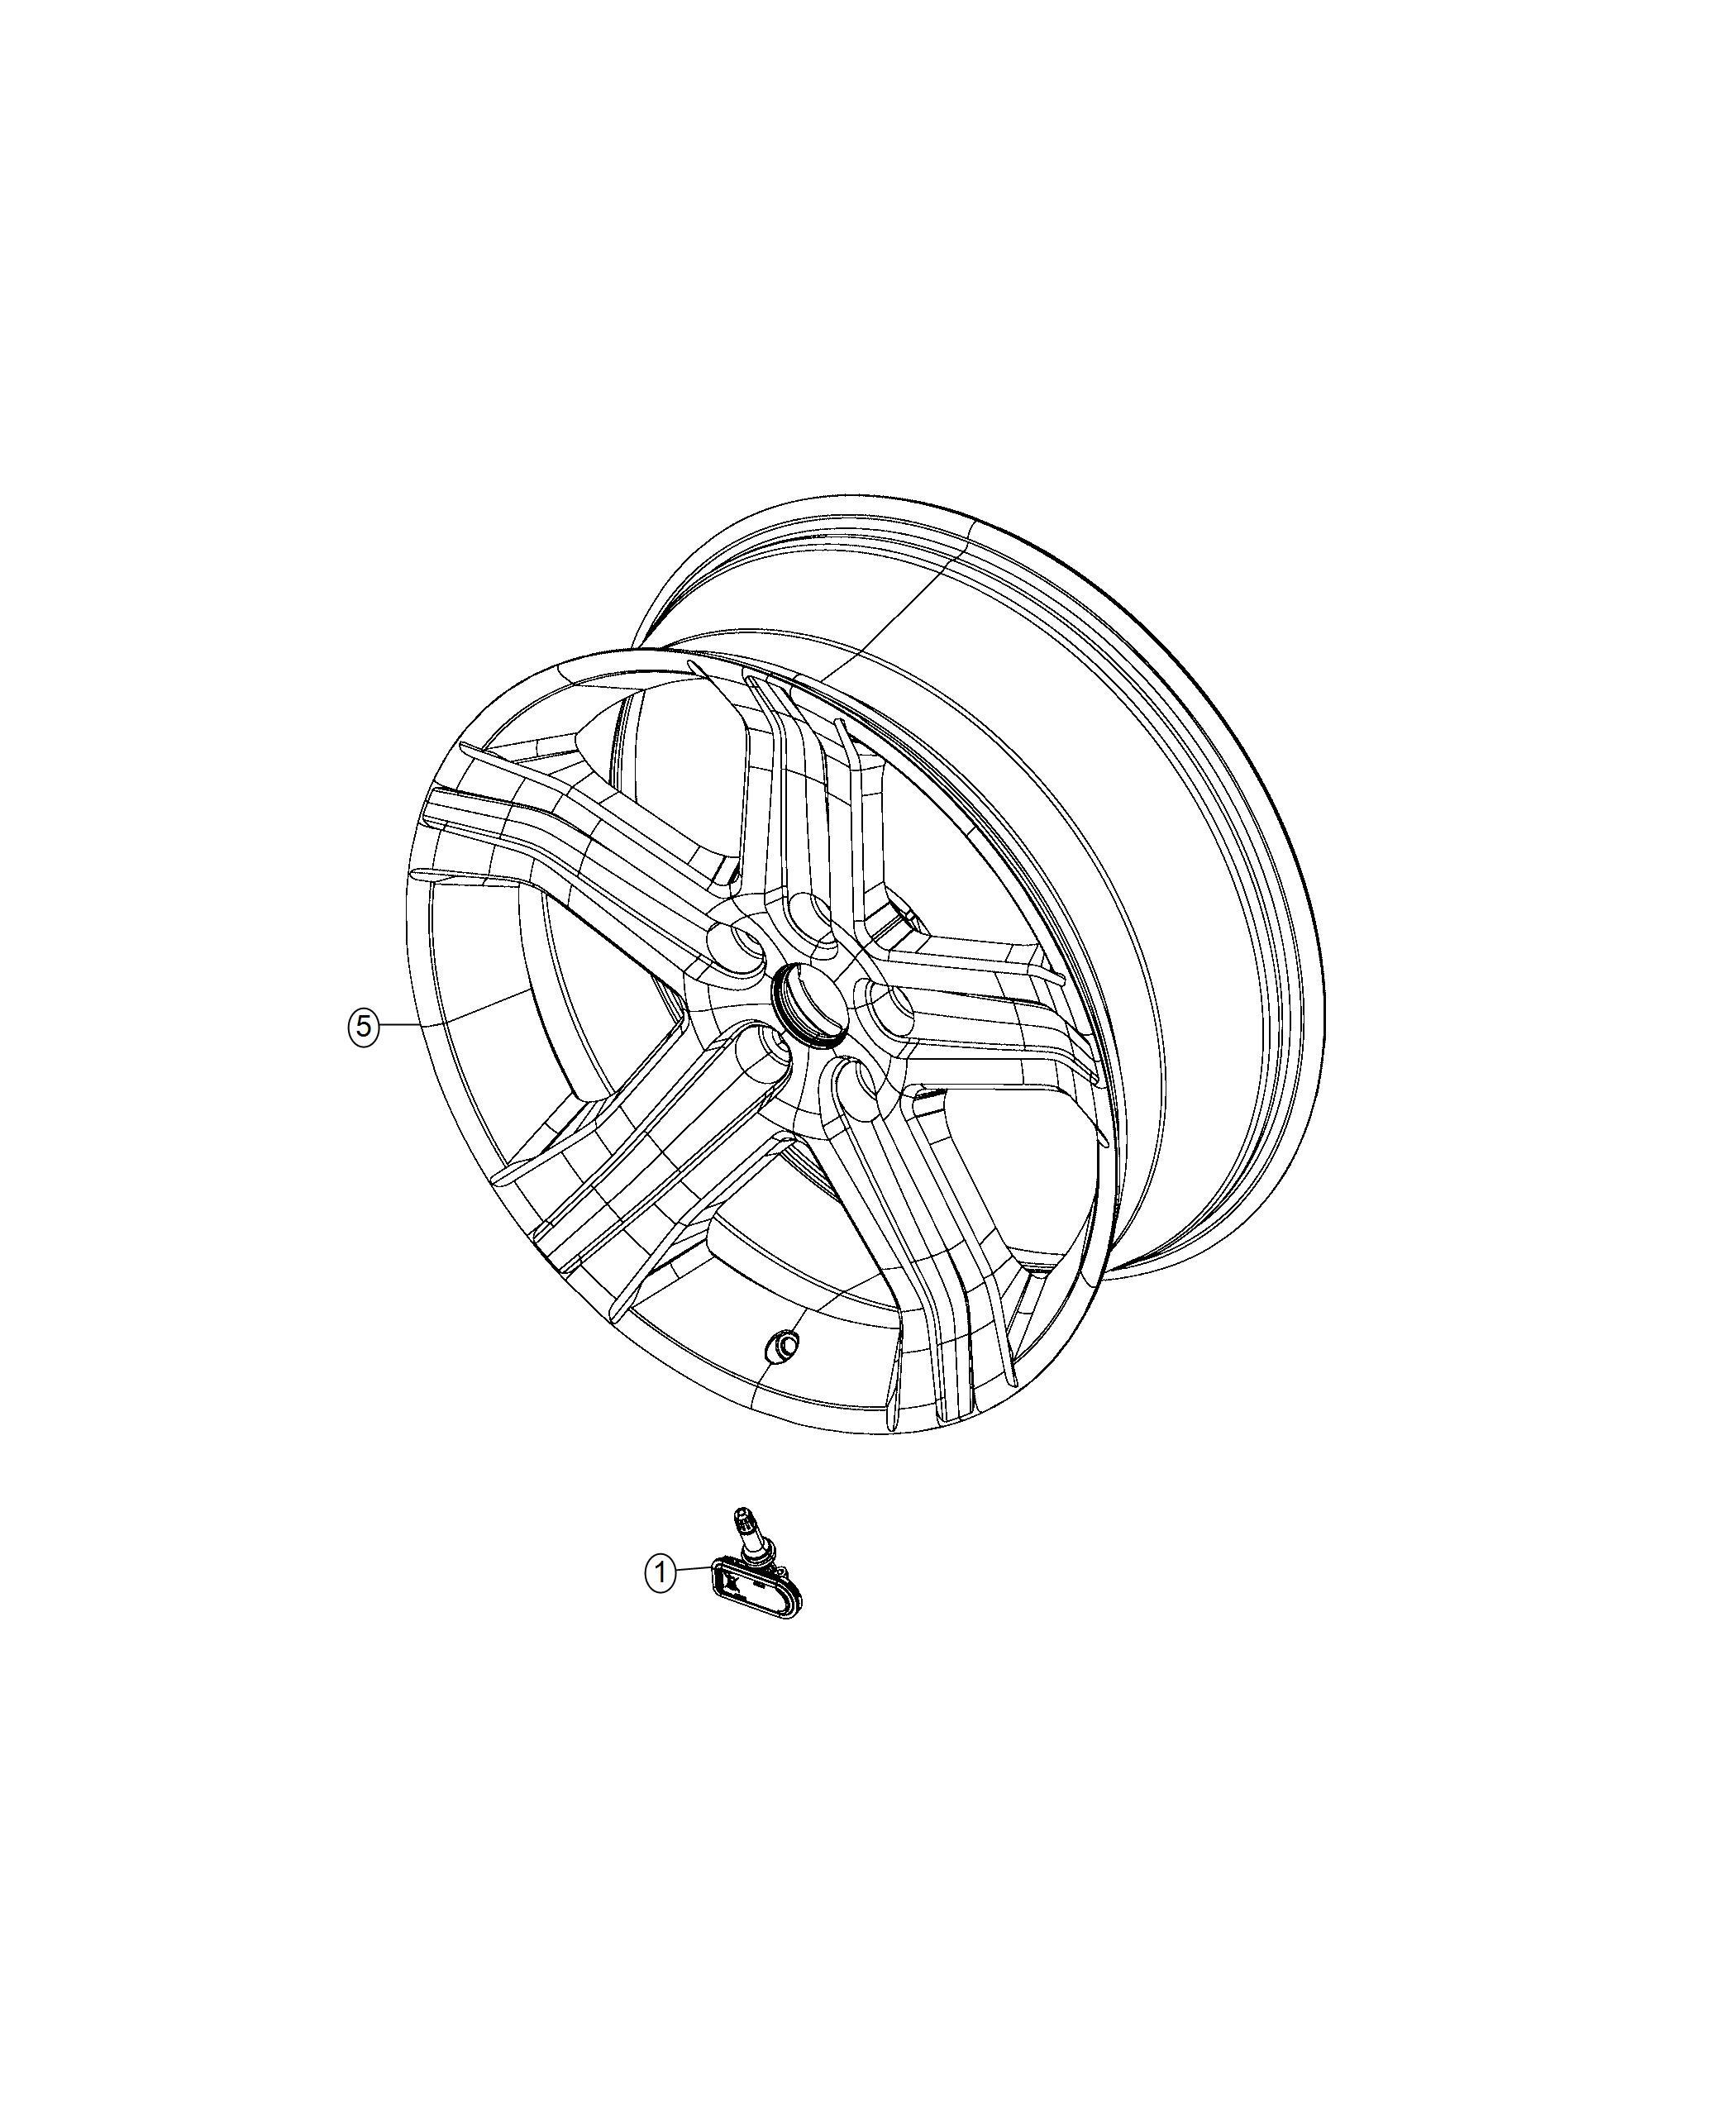 Ram Valve Core Kit Valve Stem Rear Inner Trim No